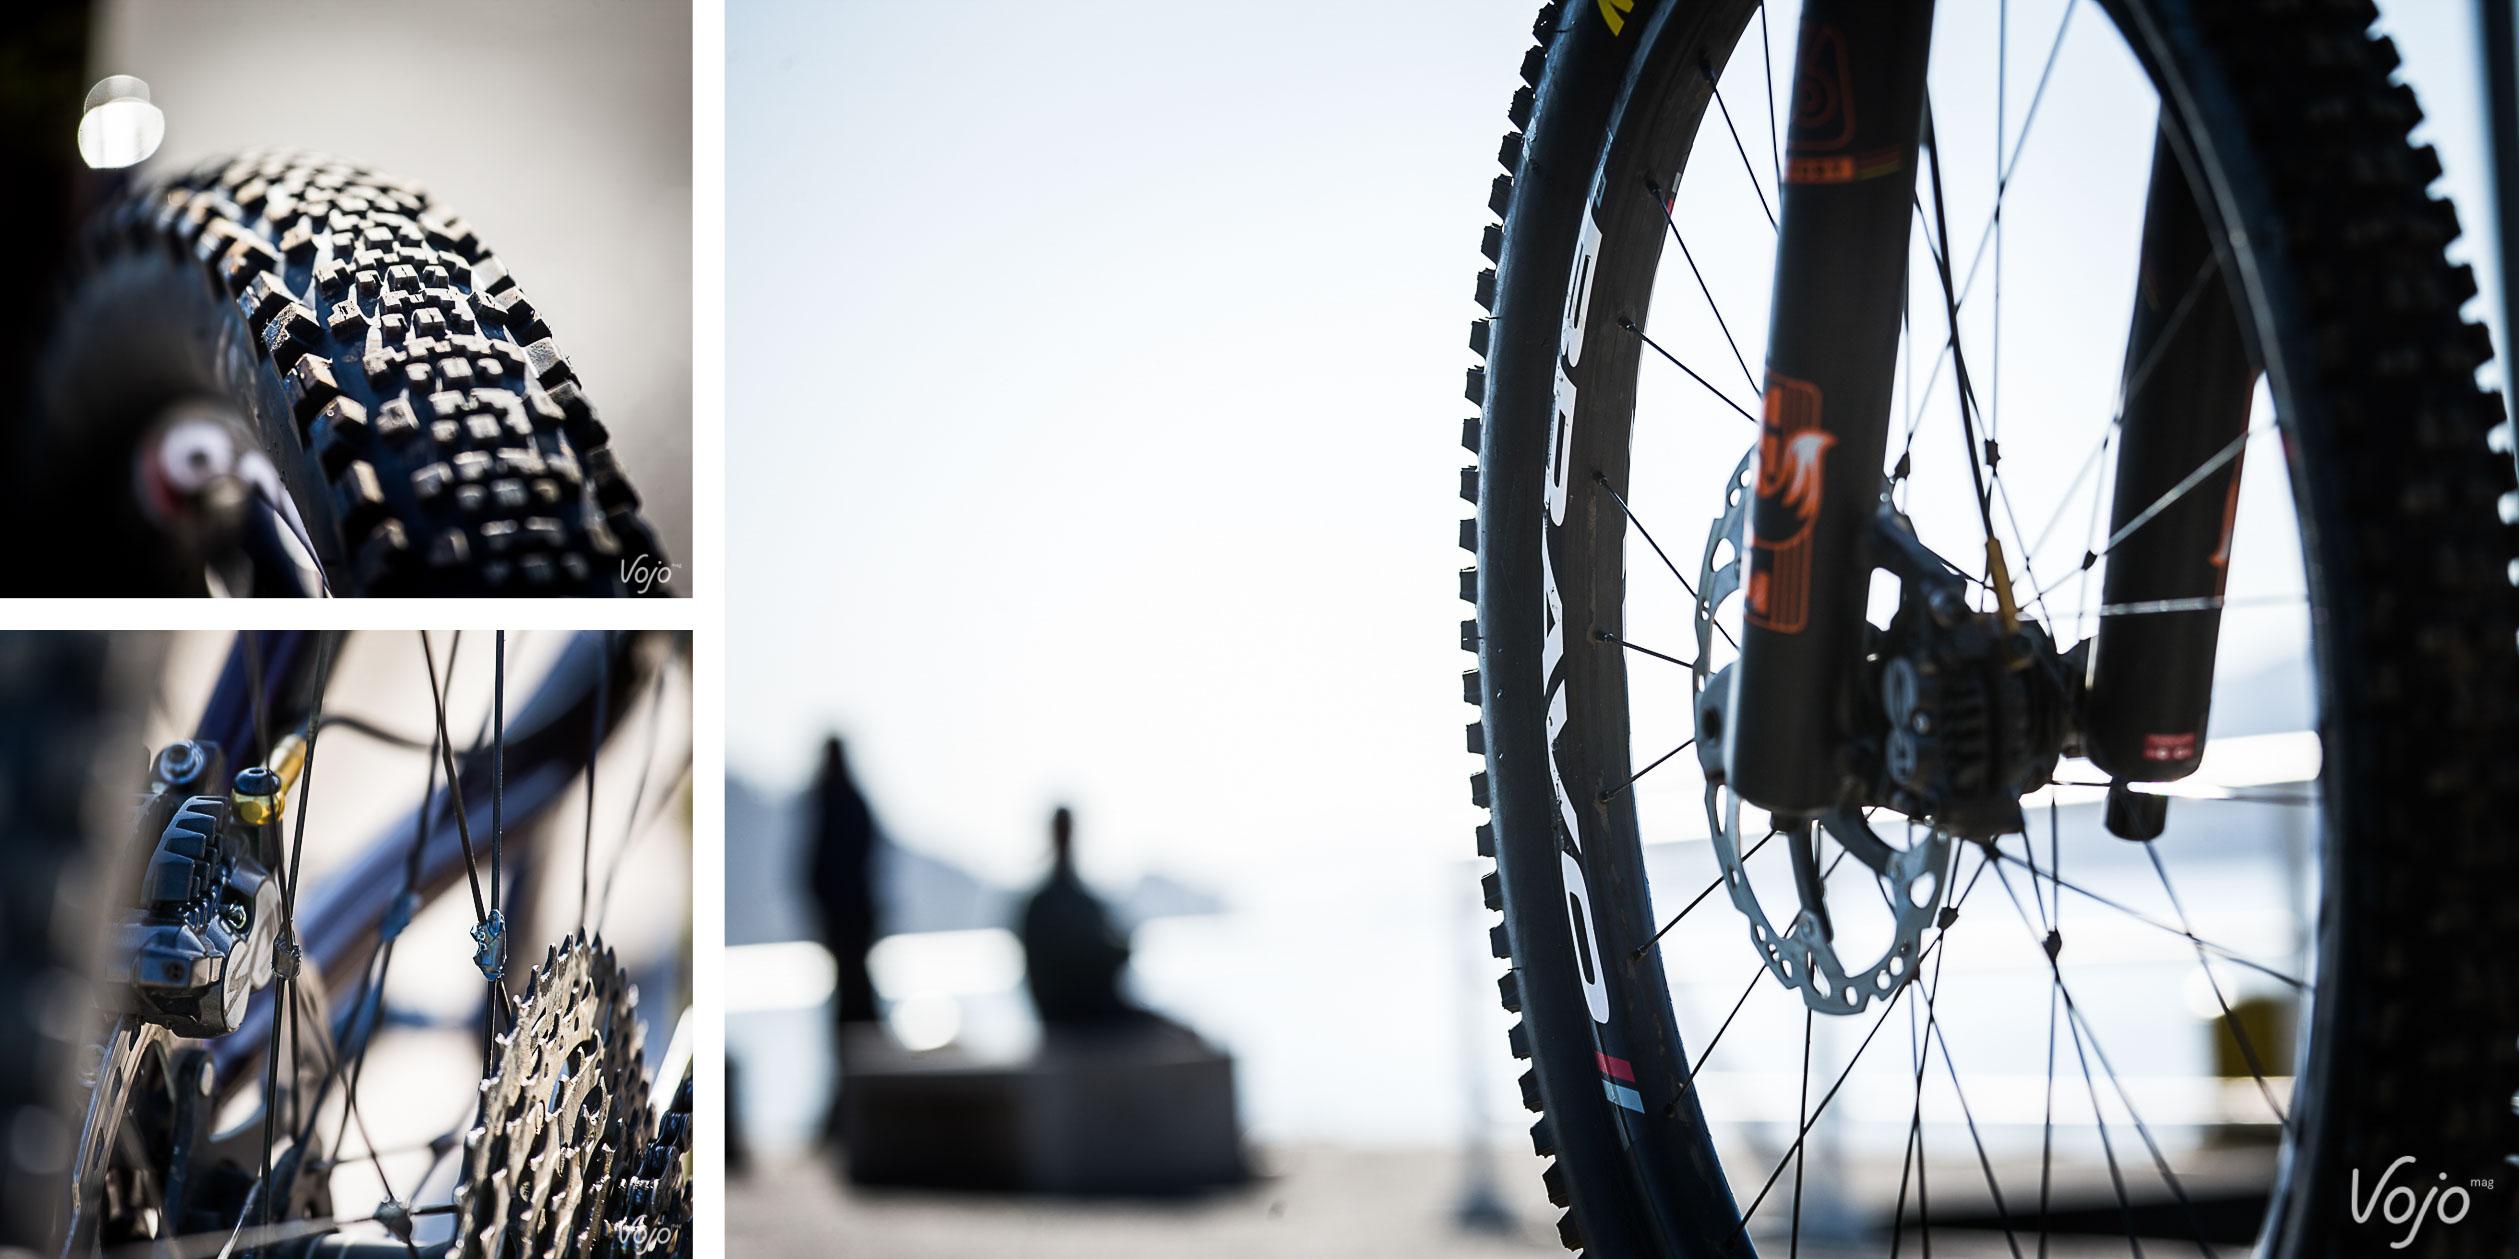 4-Florian_Nicolai_Rocky_Mountain_Altitude_Bikecheck_Copyright_OBeart_VojoMag-1